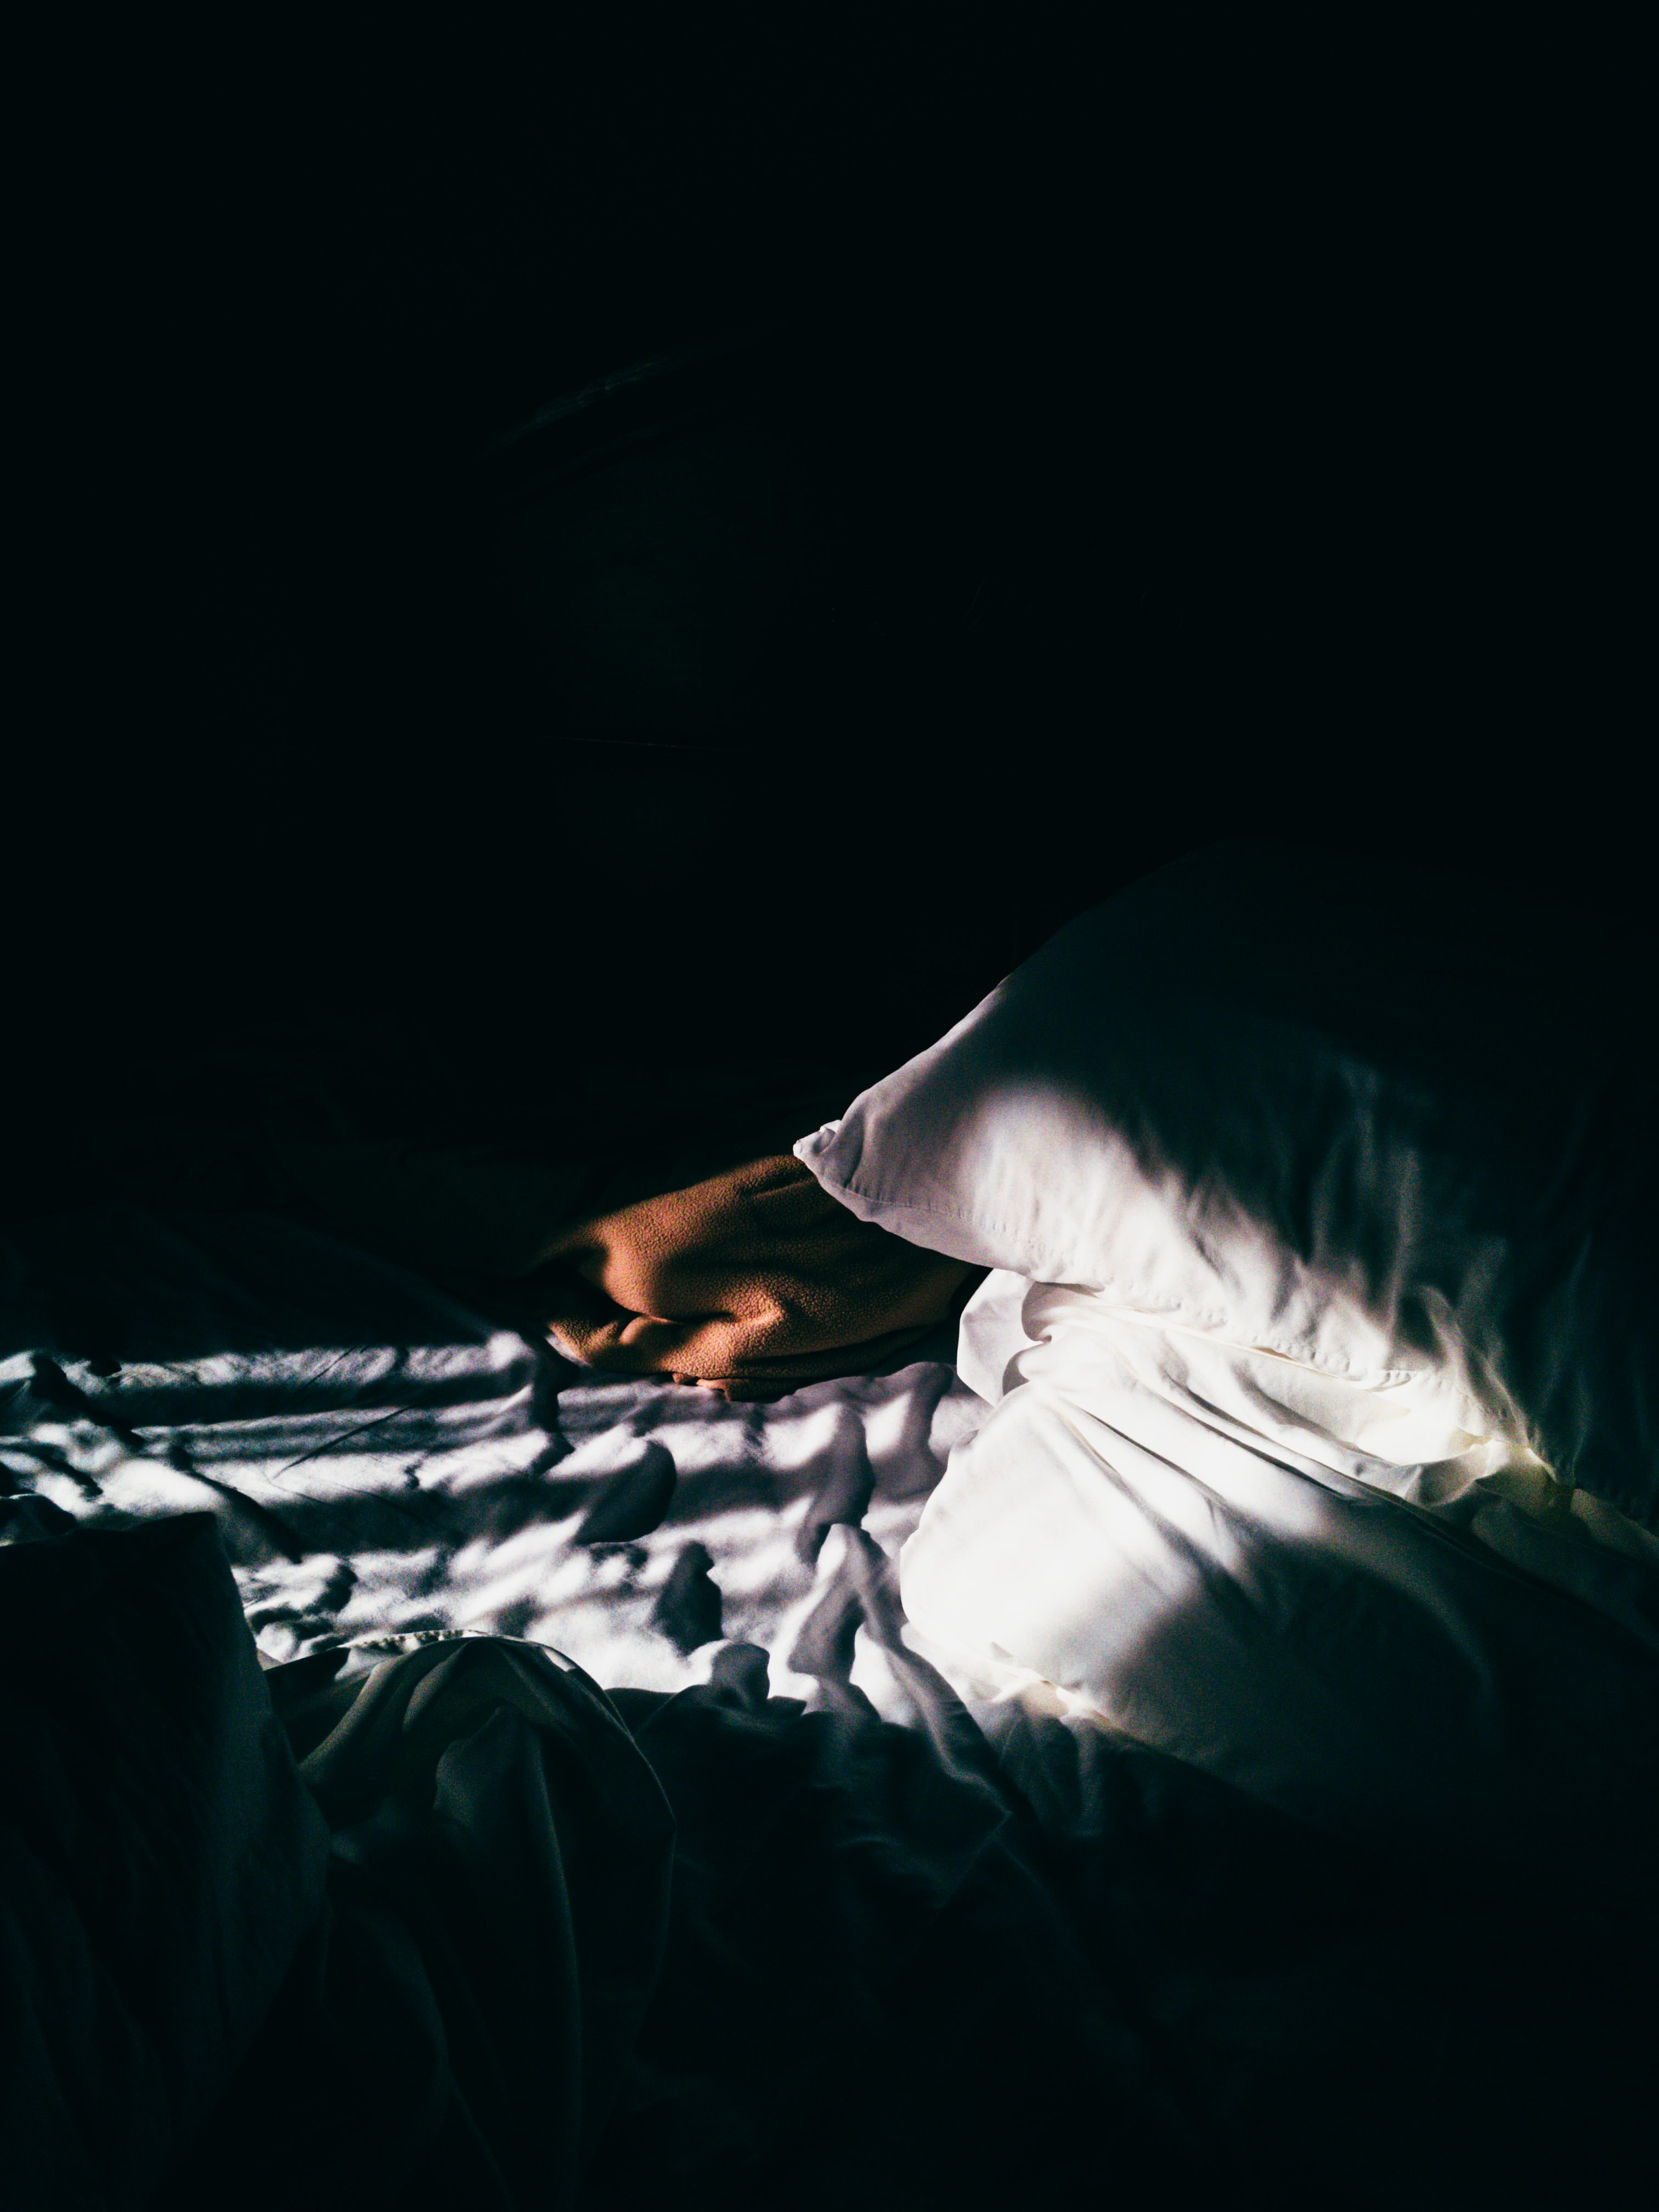 gray throw pillow on gray bedspread